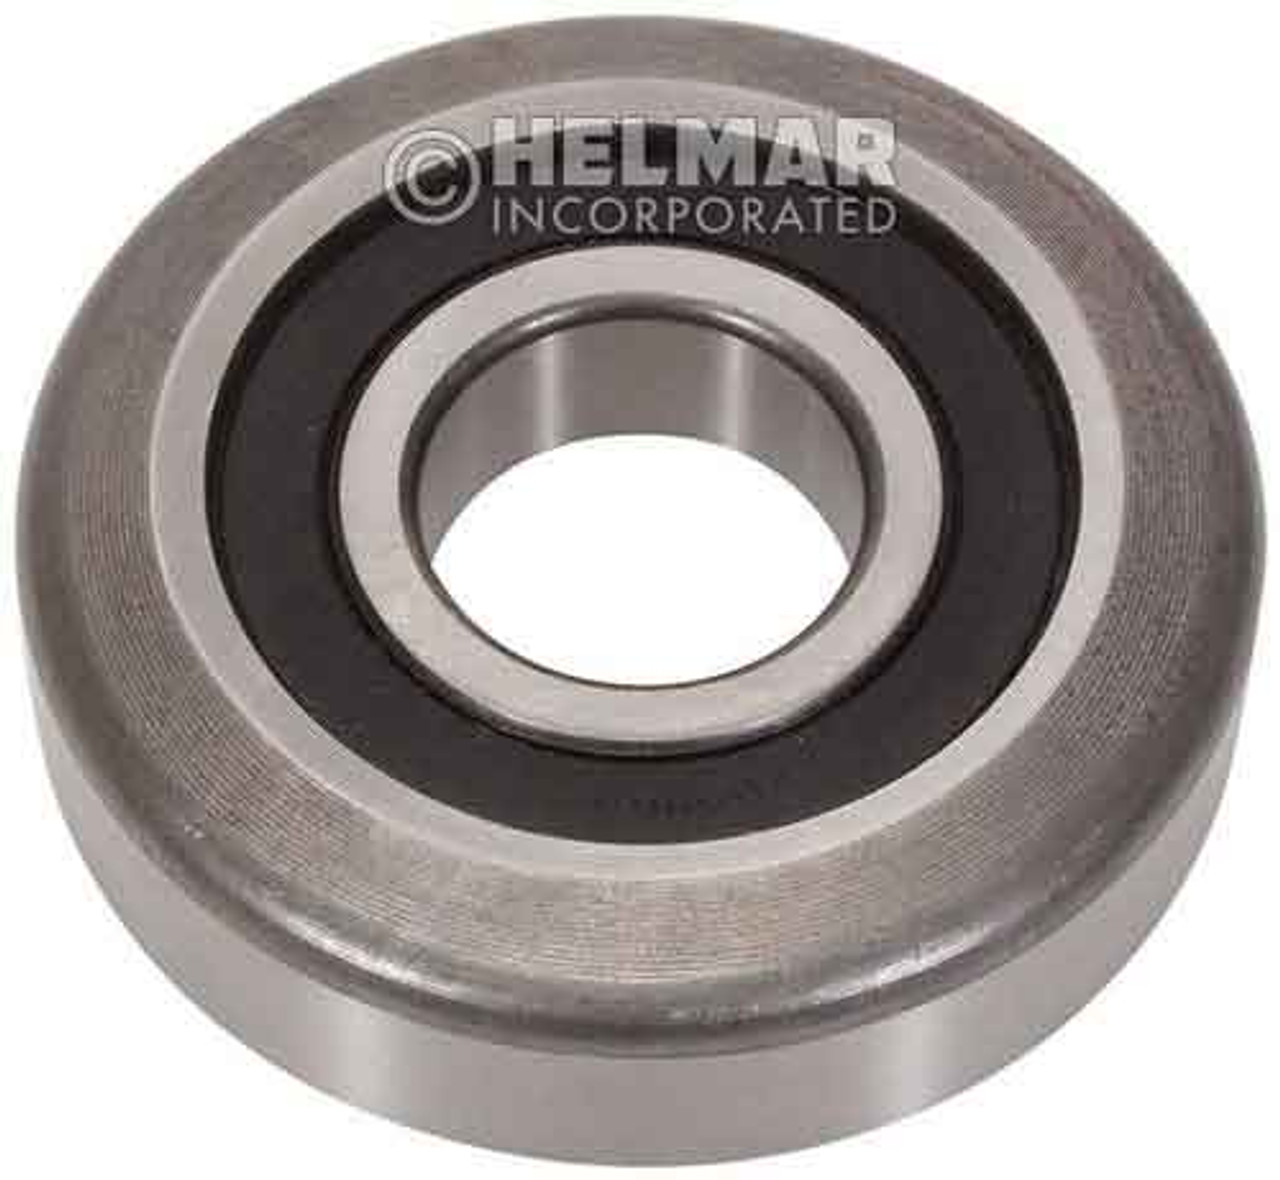 077943 Crown Mast Roller Bearing 31.69mm Wide, 127.05mm Outer Diameter, 44.80mm Inner Diameter